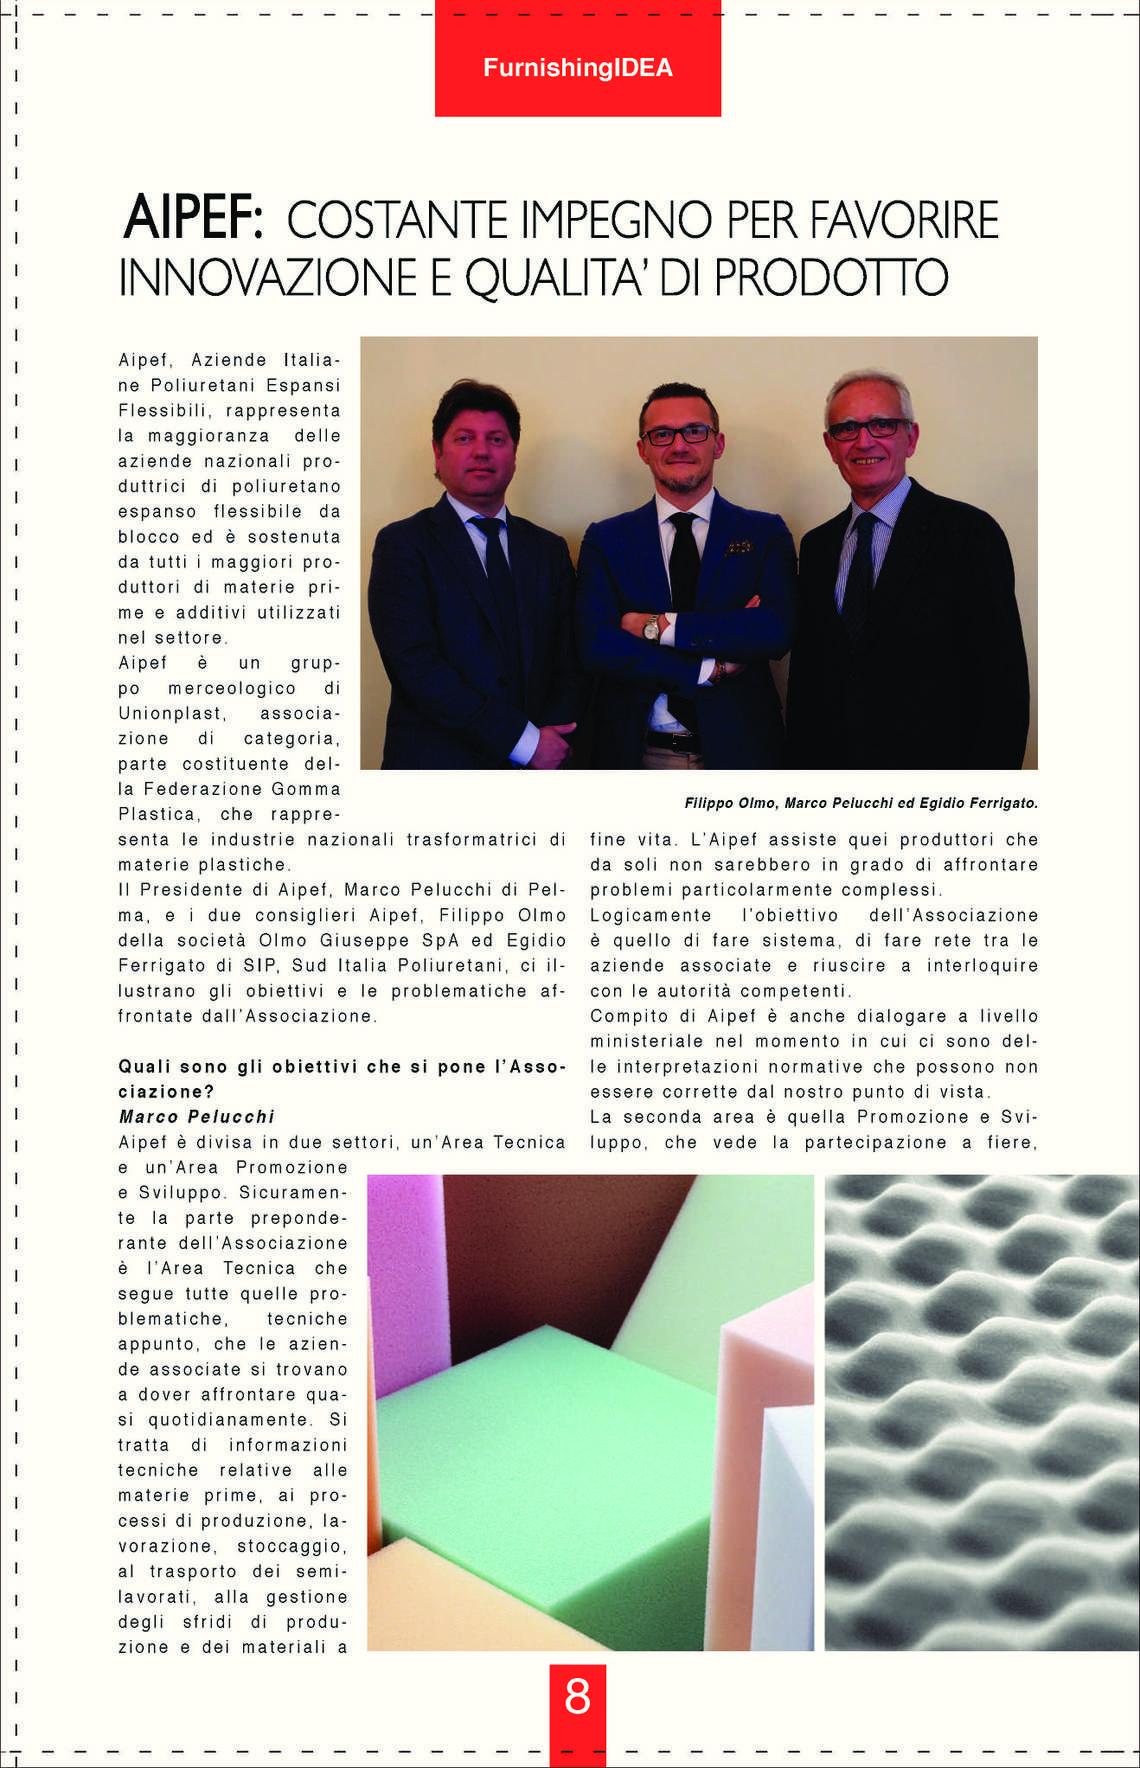 furnishing-idea-journal--1-2018_journal_9_007.jpg